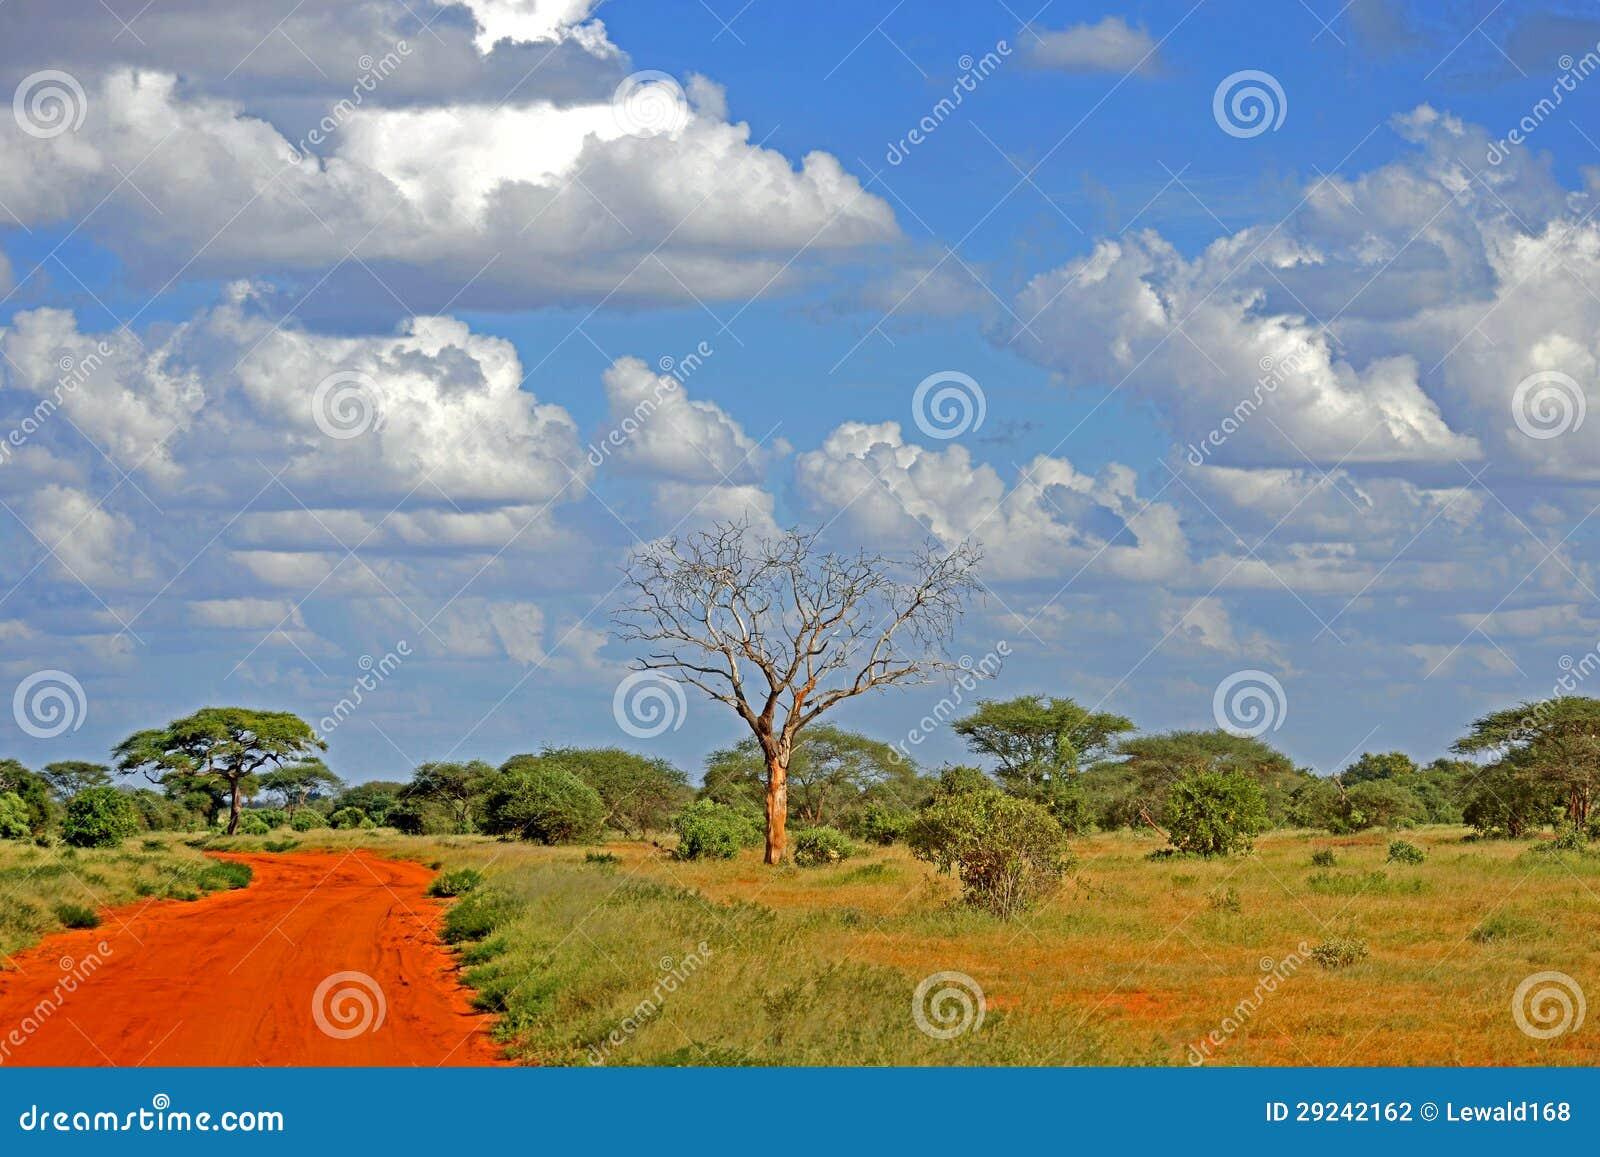 Download Safari foto de stock. Imagem de áfrica, kenya, nuvens - 29242162